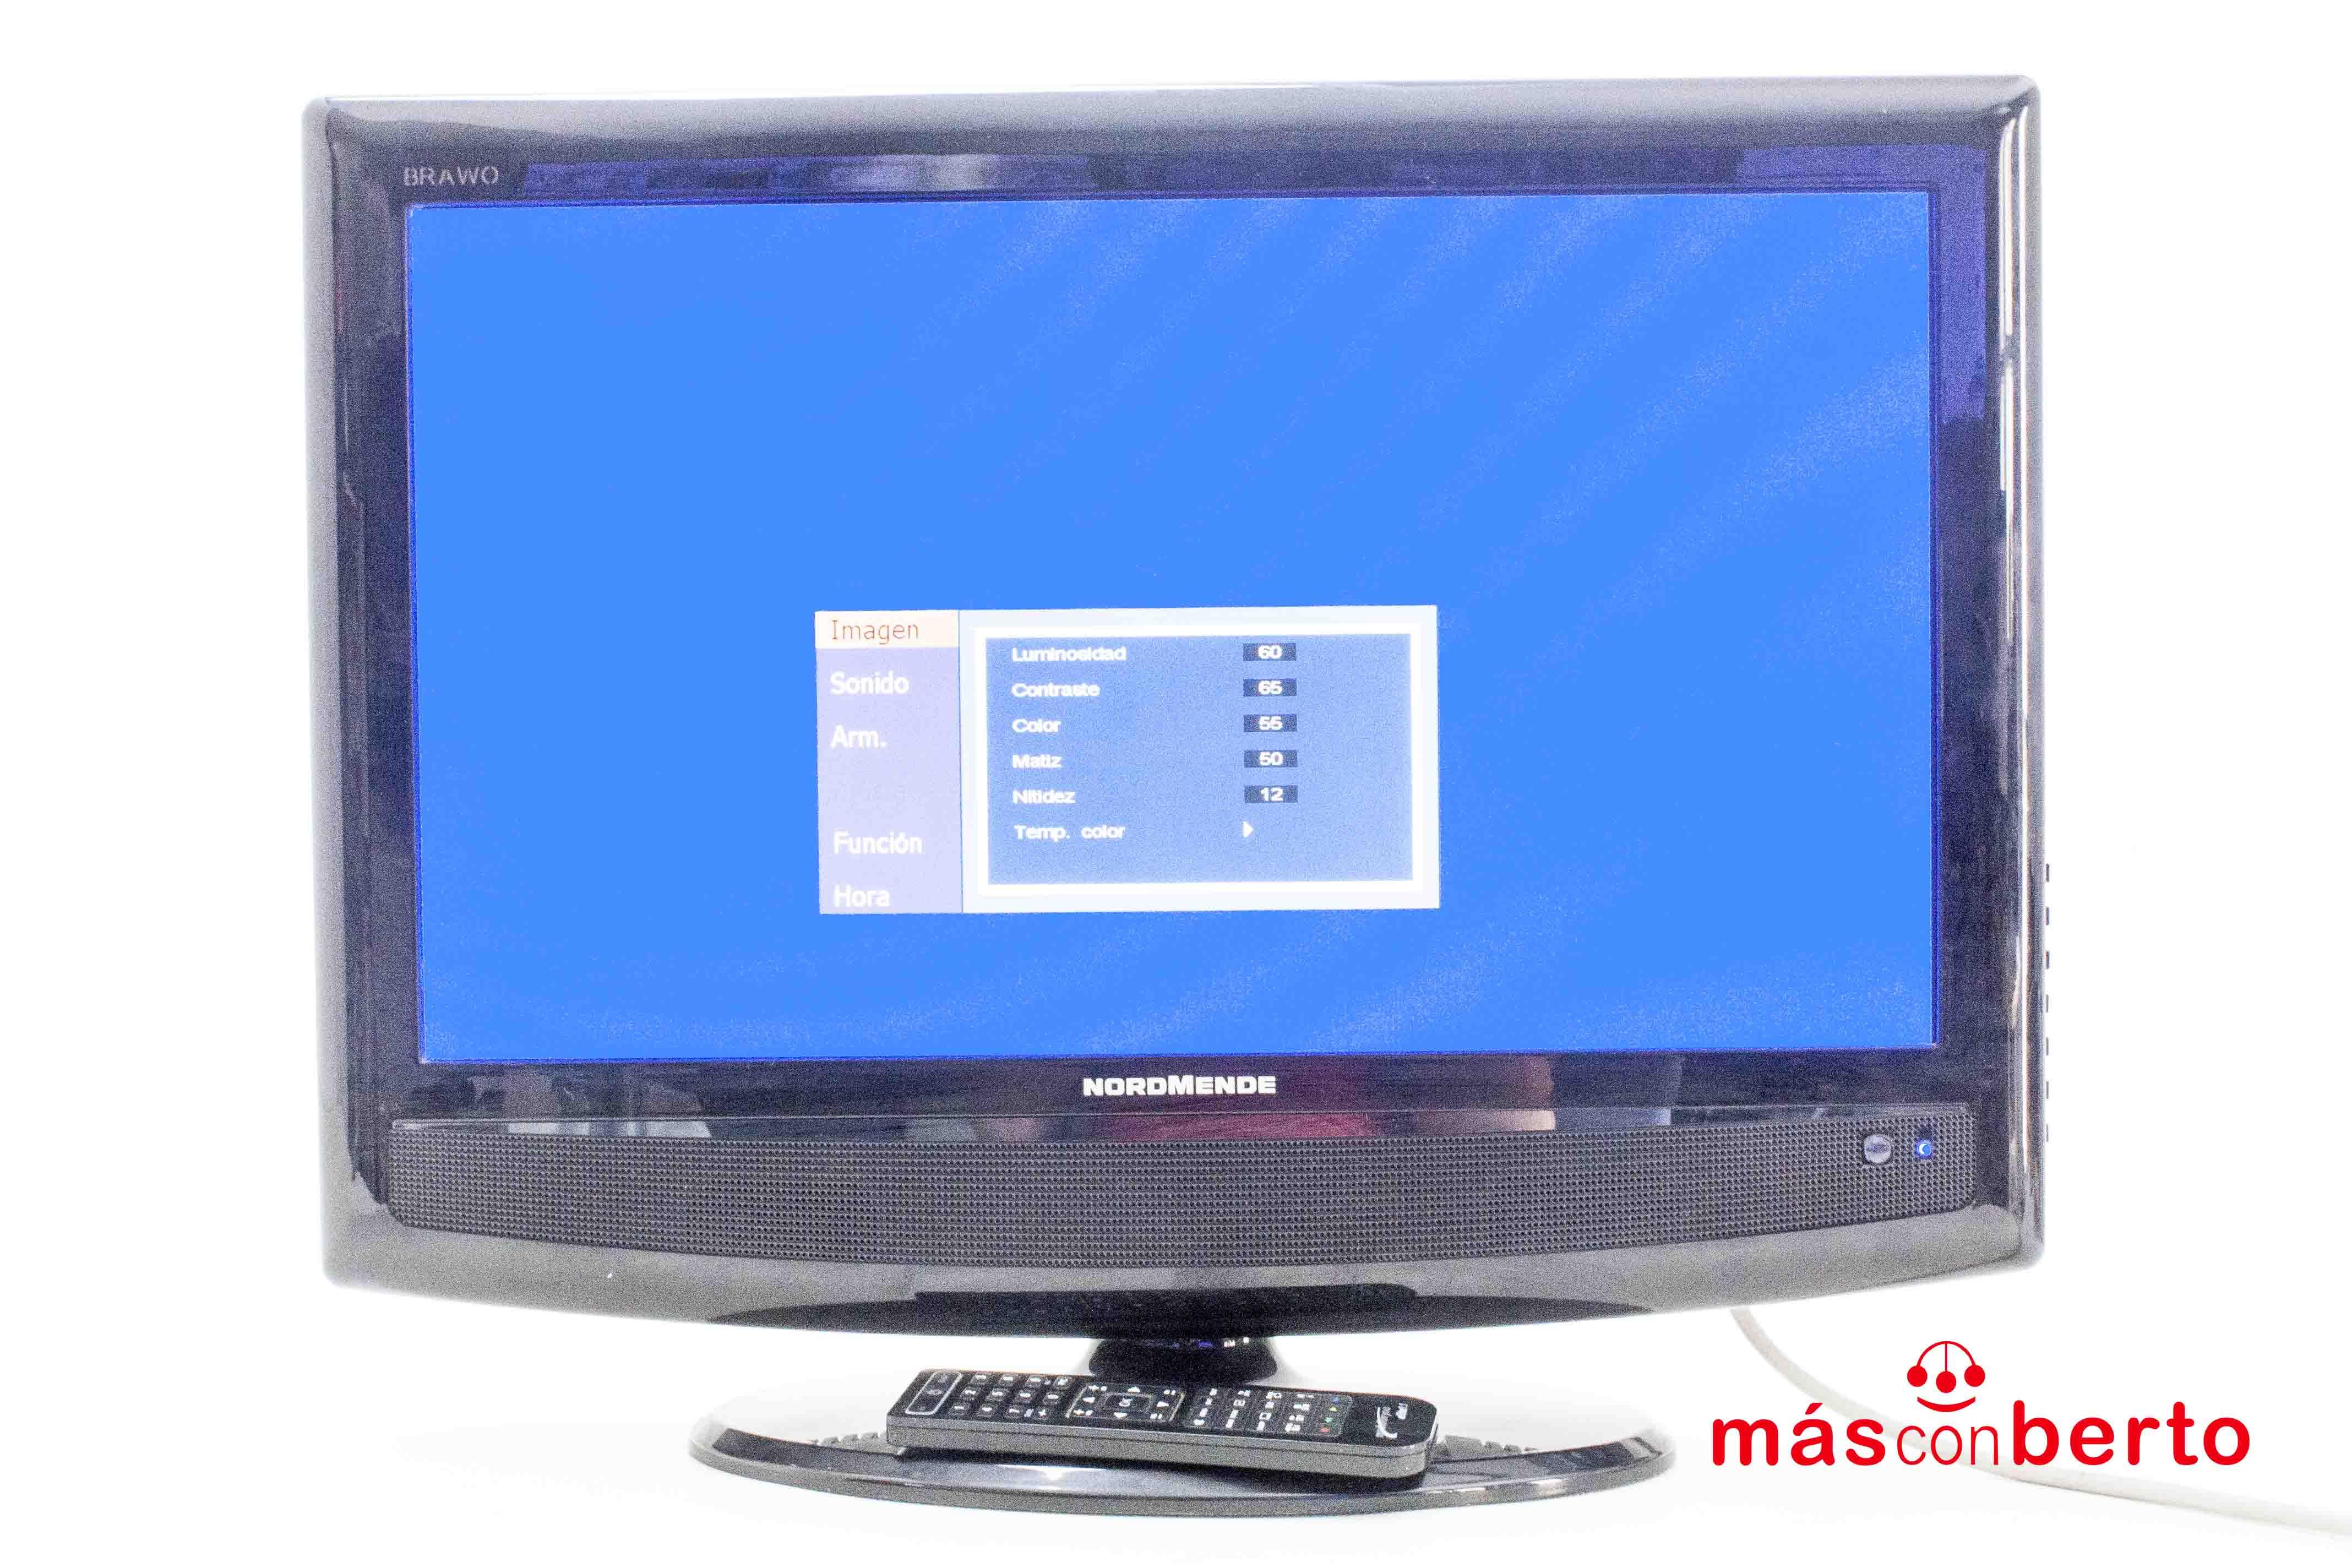 Monitor TV Nordmende N 223 LD